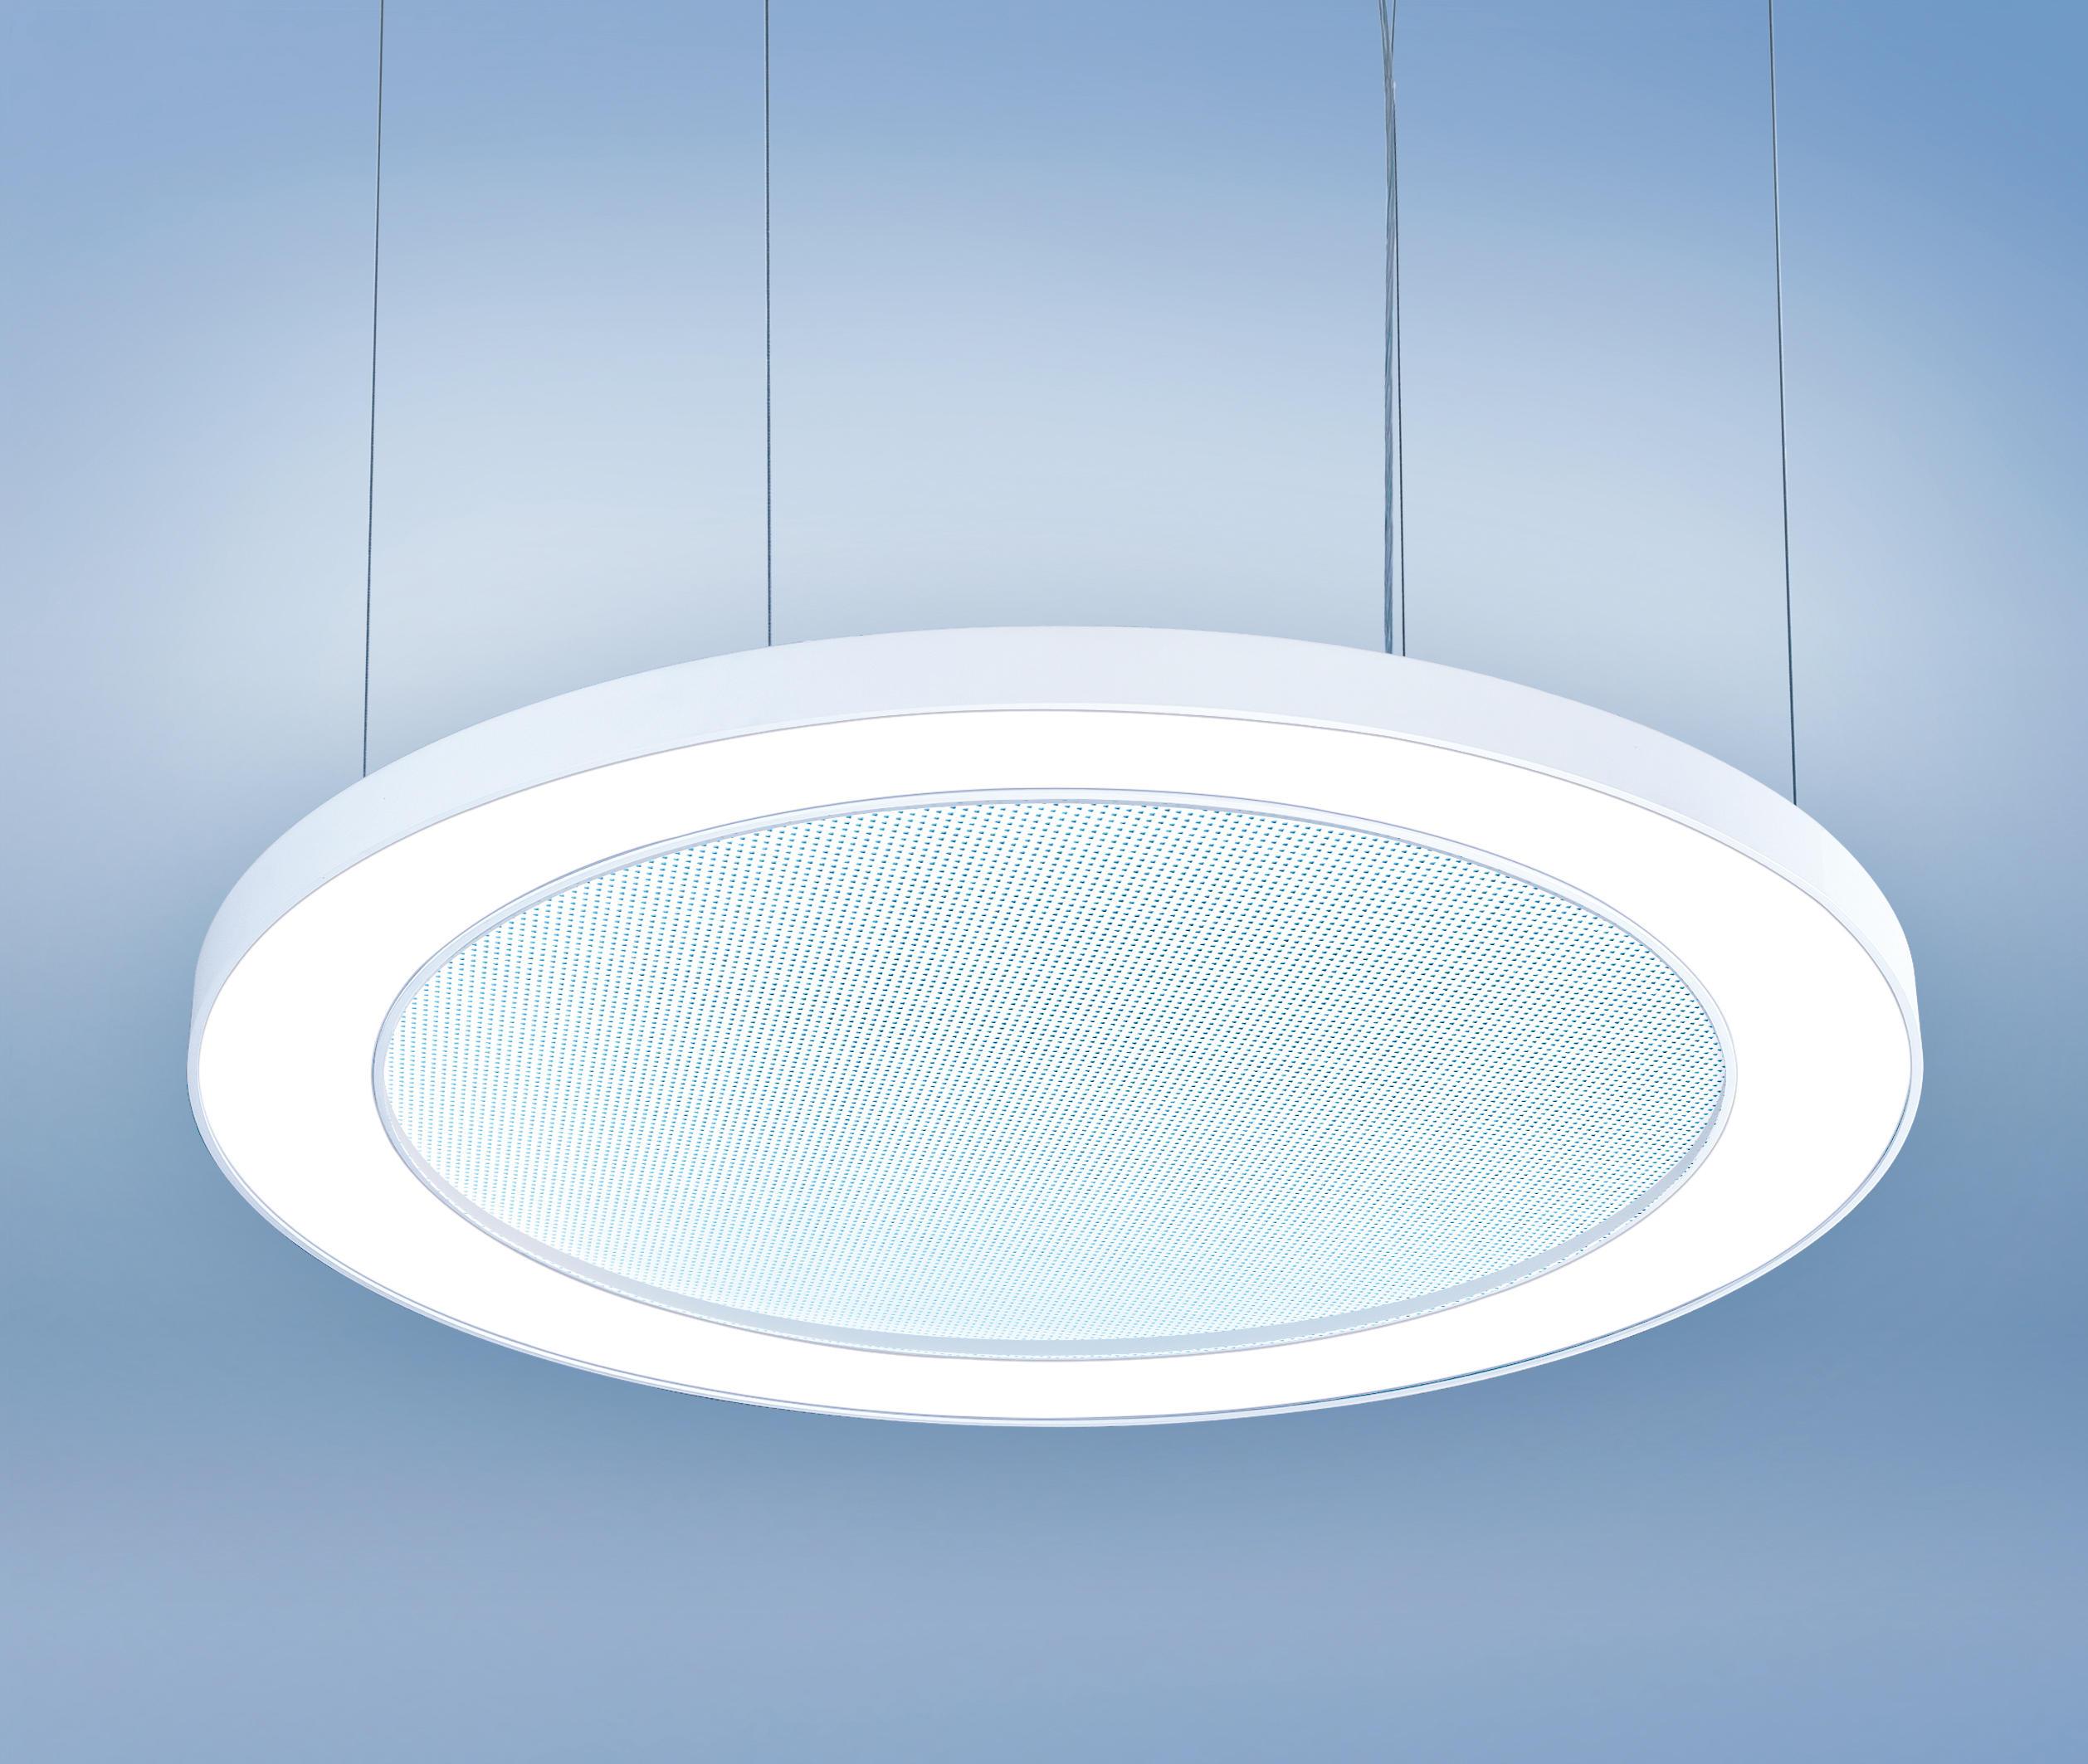 ringo star p6 g6 acoustic general lighting from lightnet architonic. Black Bedroom Furniture Sets. Home Design Ideas